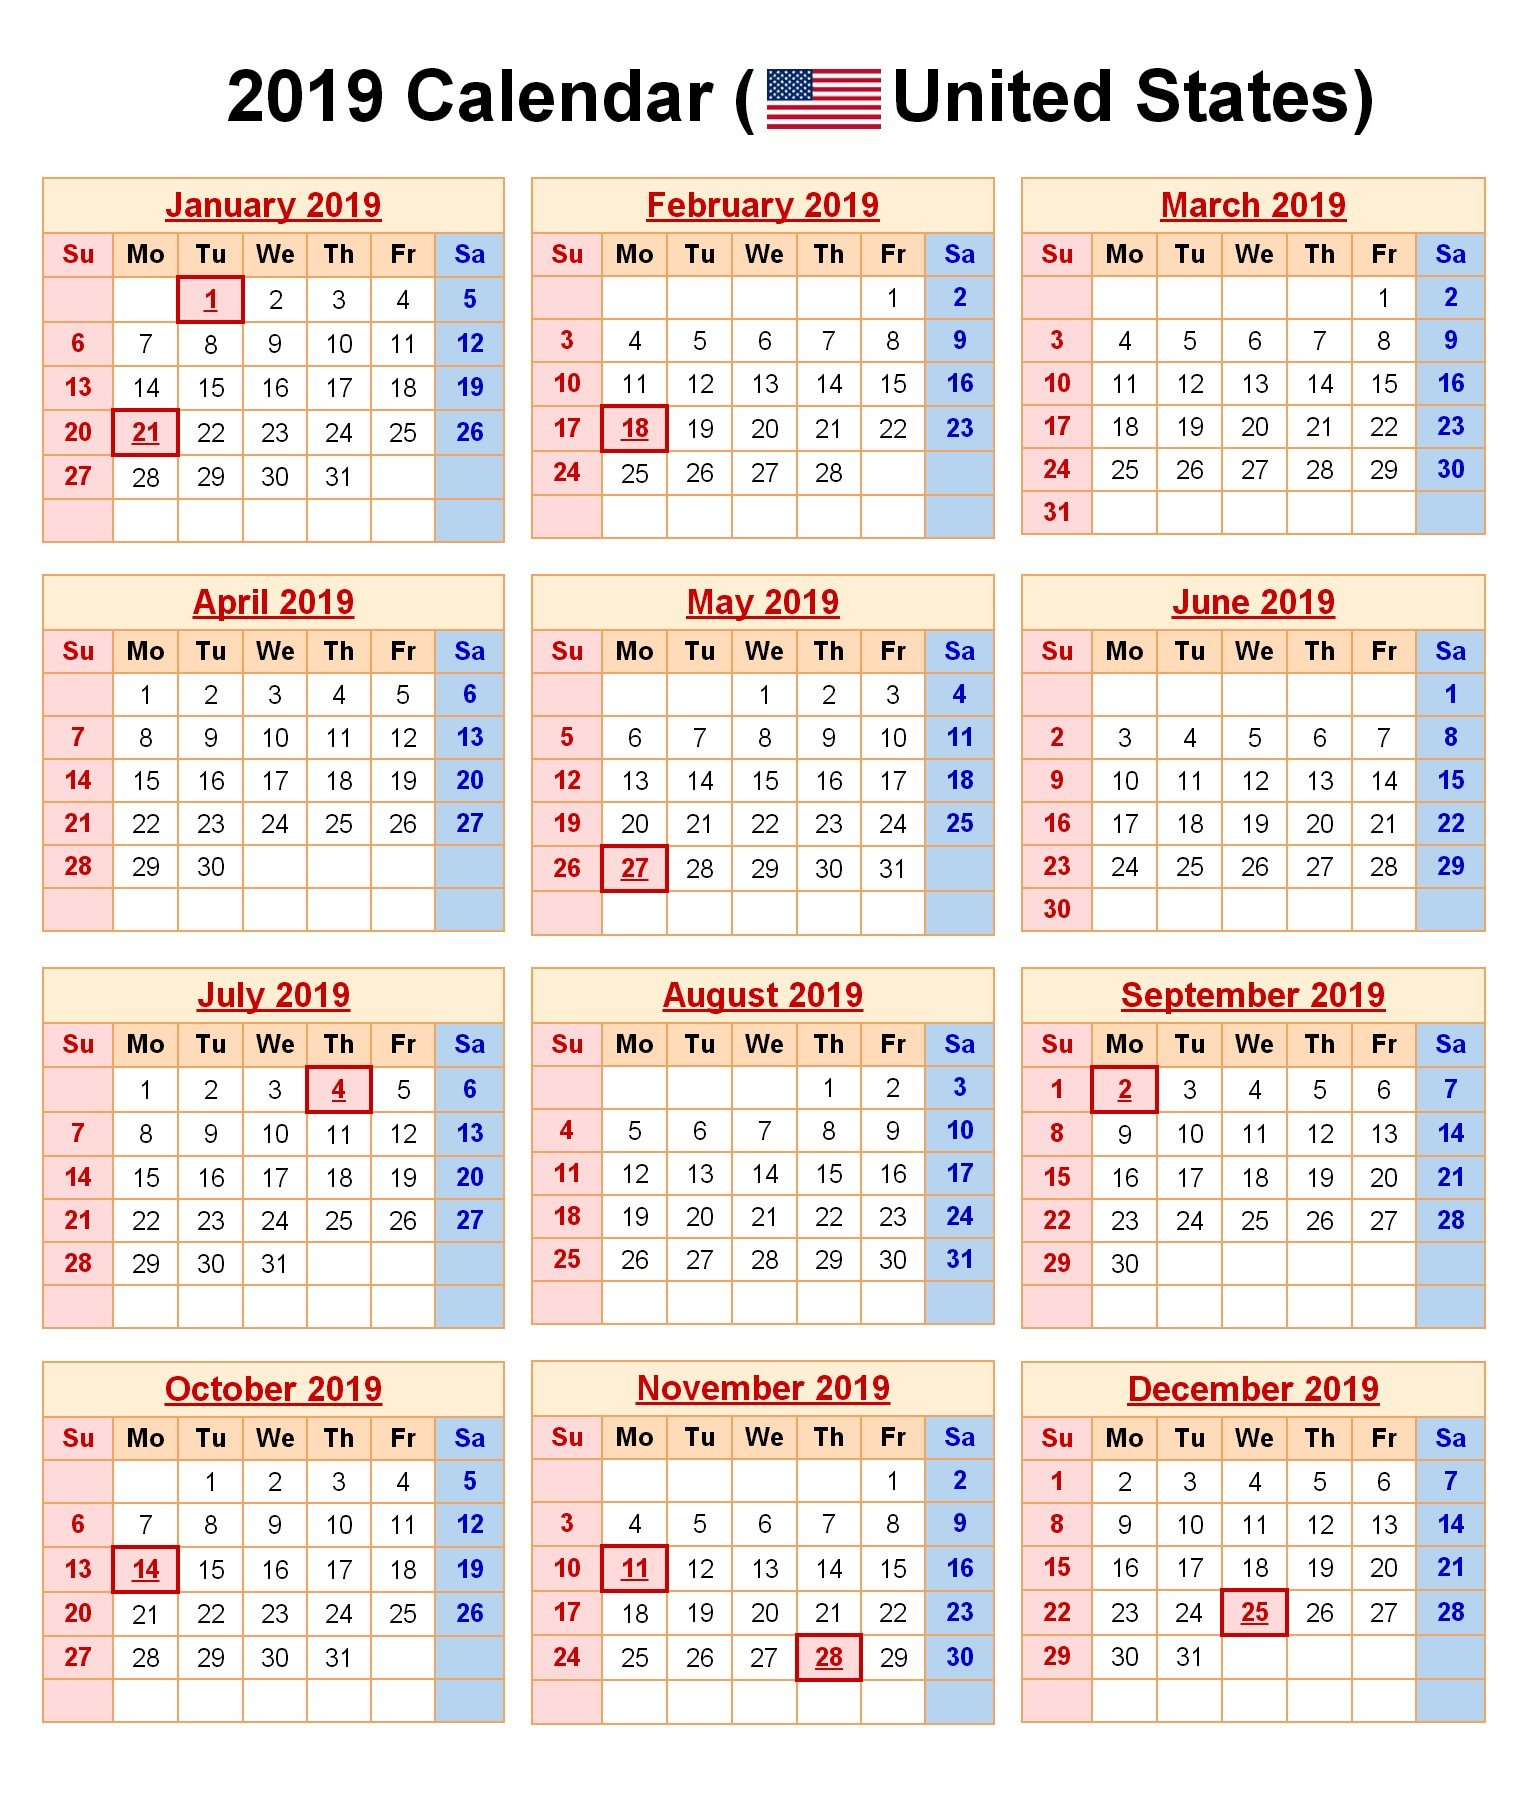 2019 Printable Calendar With Us Holidays Printable Calendar 2019 Calendar 2019 United States